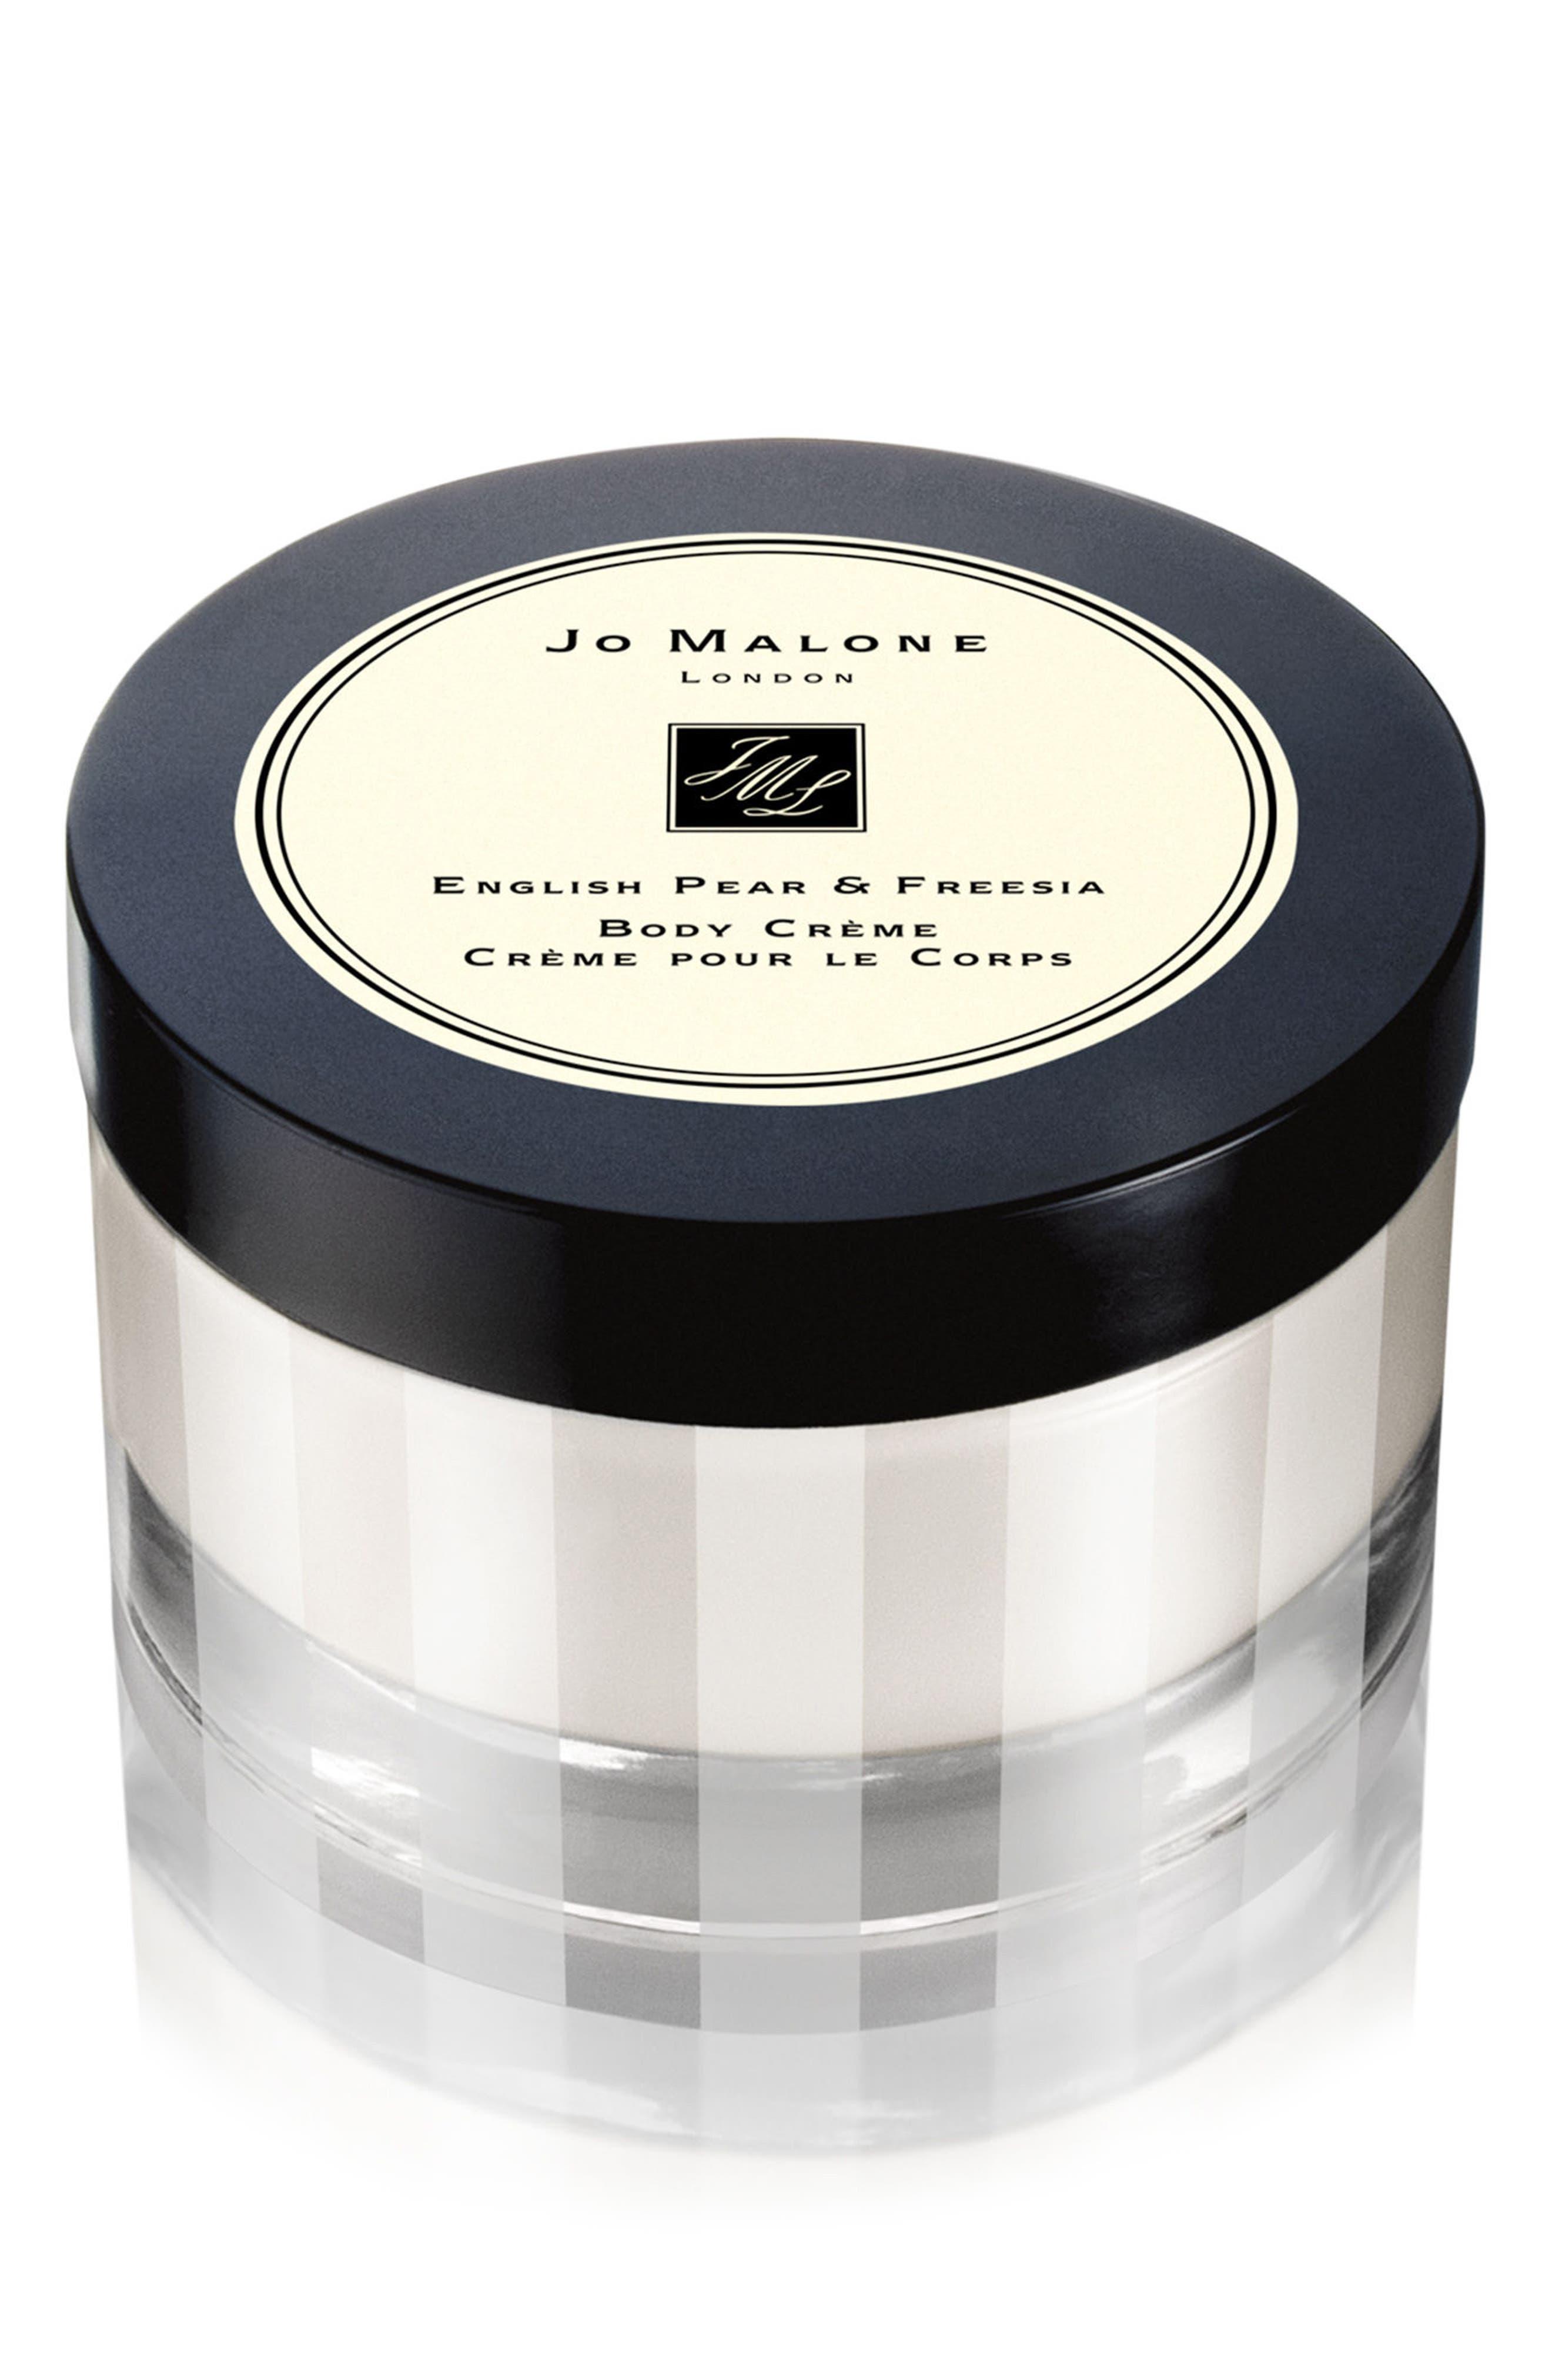 Alternate Image 1 Selected - Jo Malone London™ 'English Pear & Freesia' Body Crème